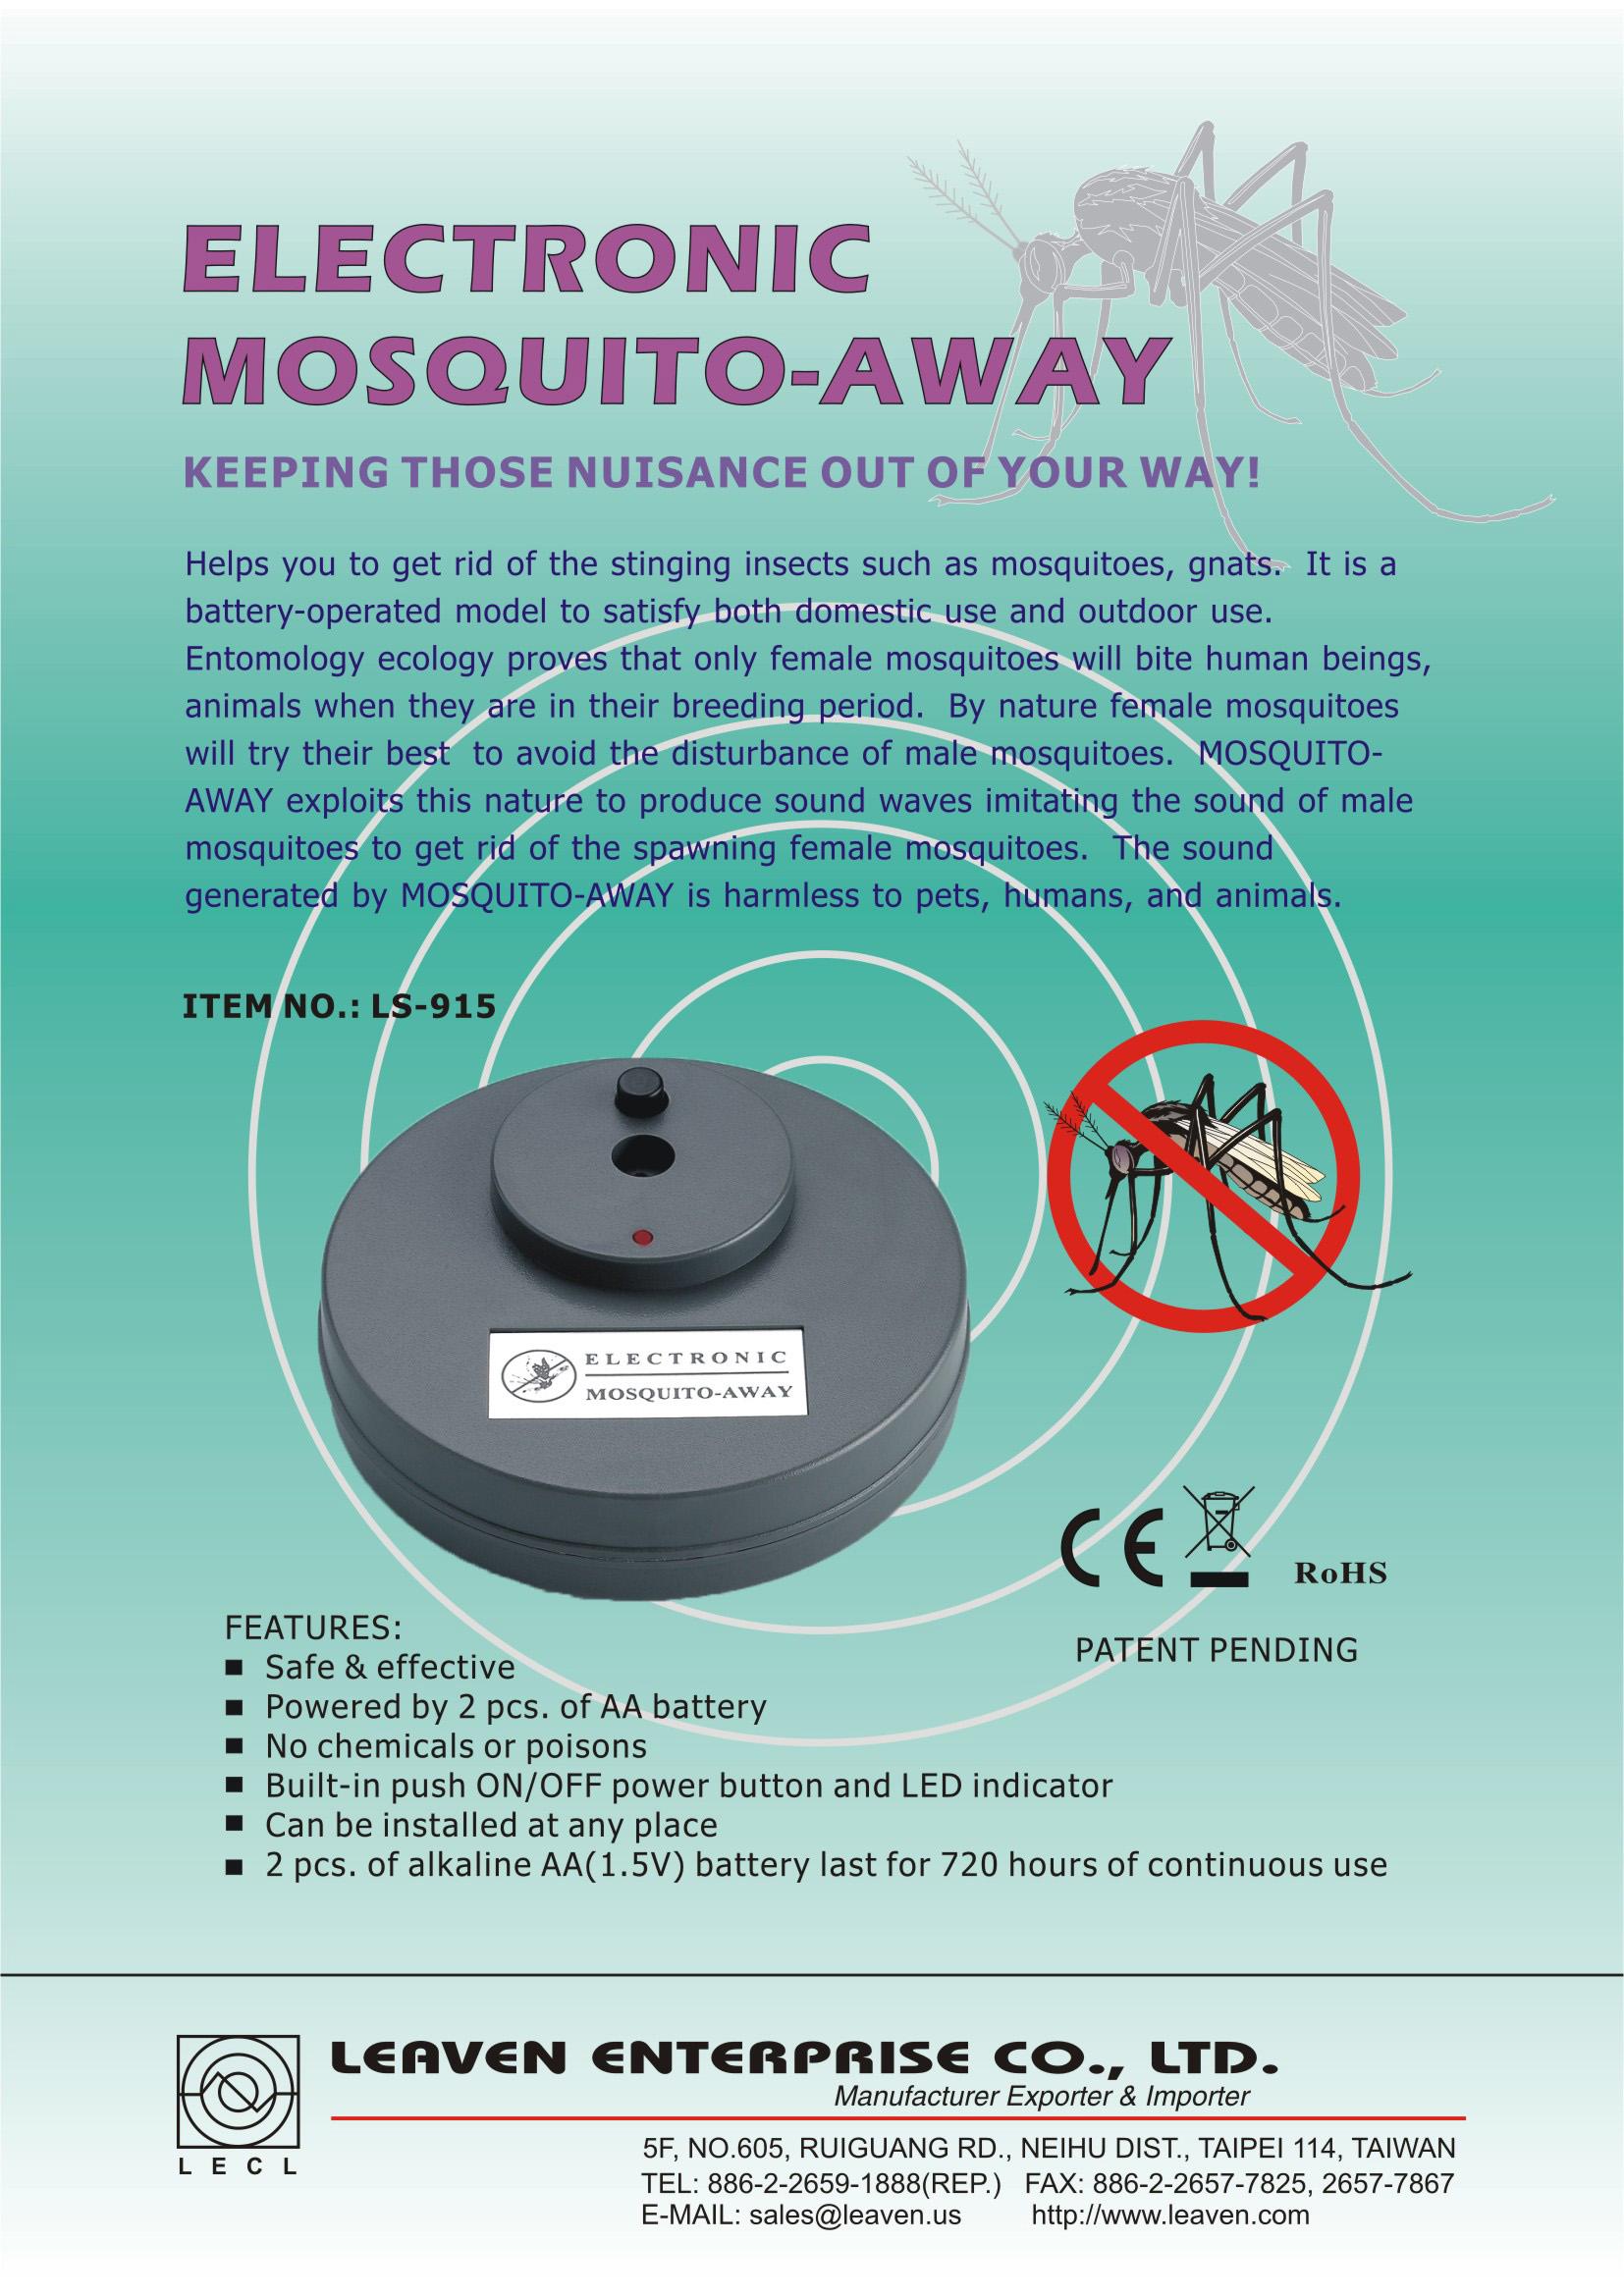 Pest Repeller Animal Manufacturer Leaven Enterprise Co Mosquito Power Saver Circuit Ls 915 Away